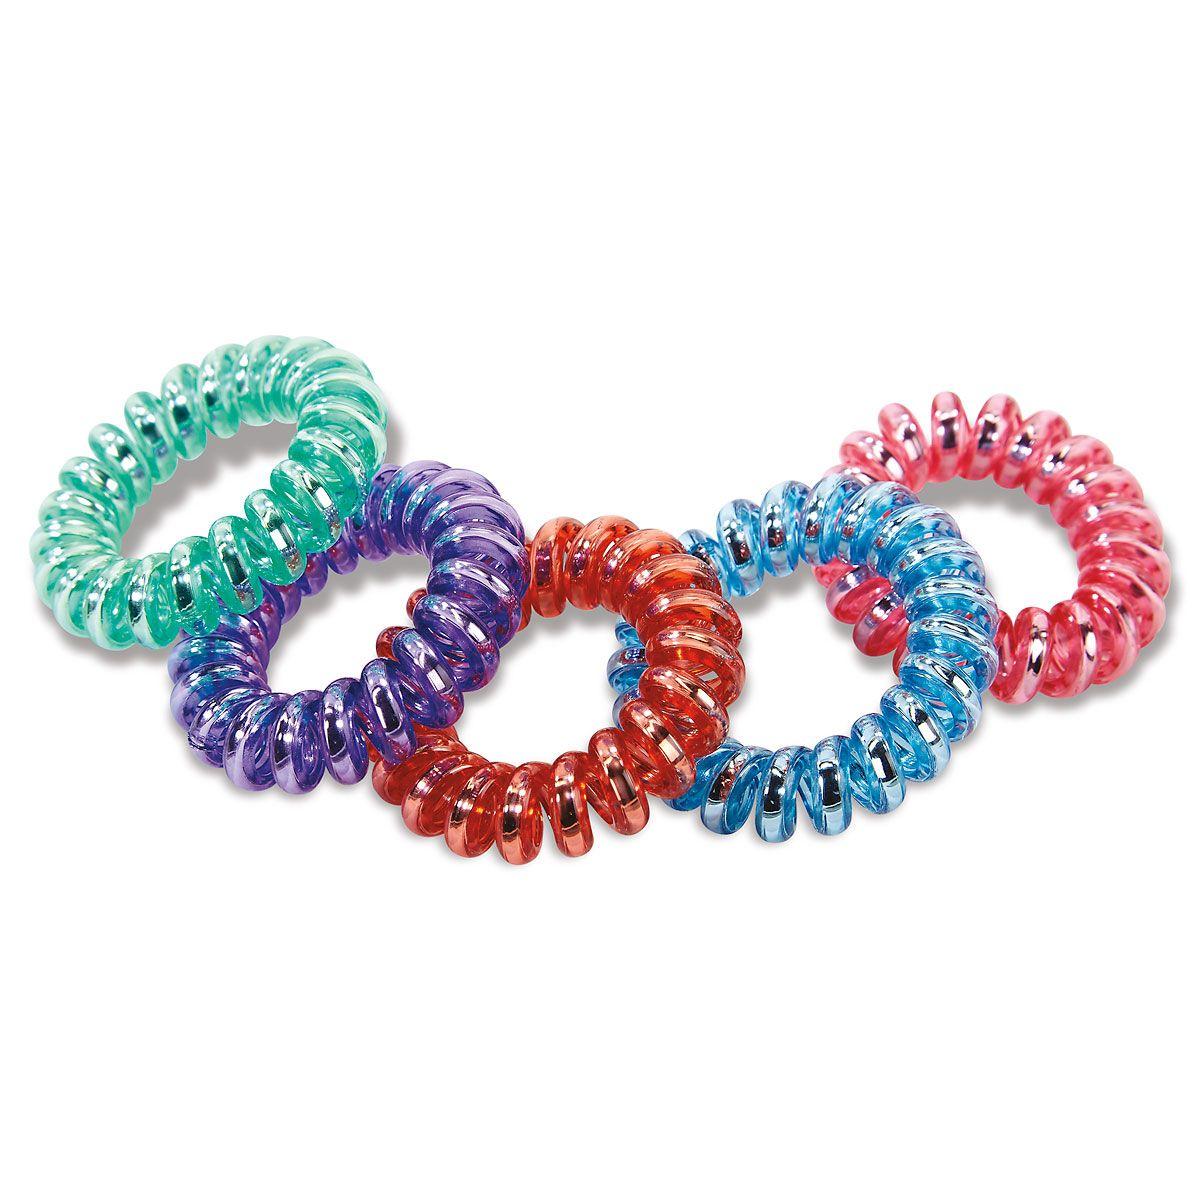 Mini Everlasting Hair Bands